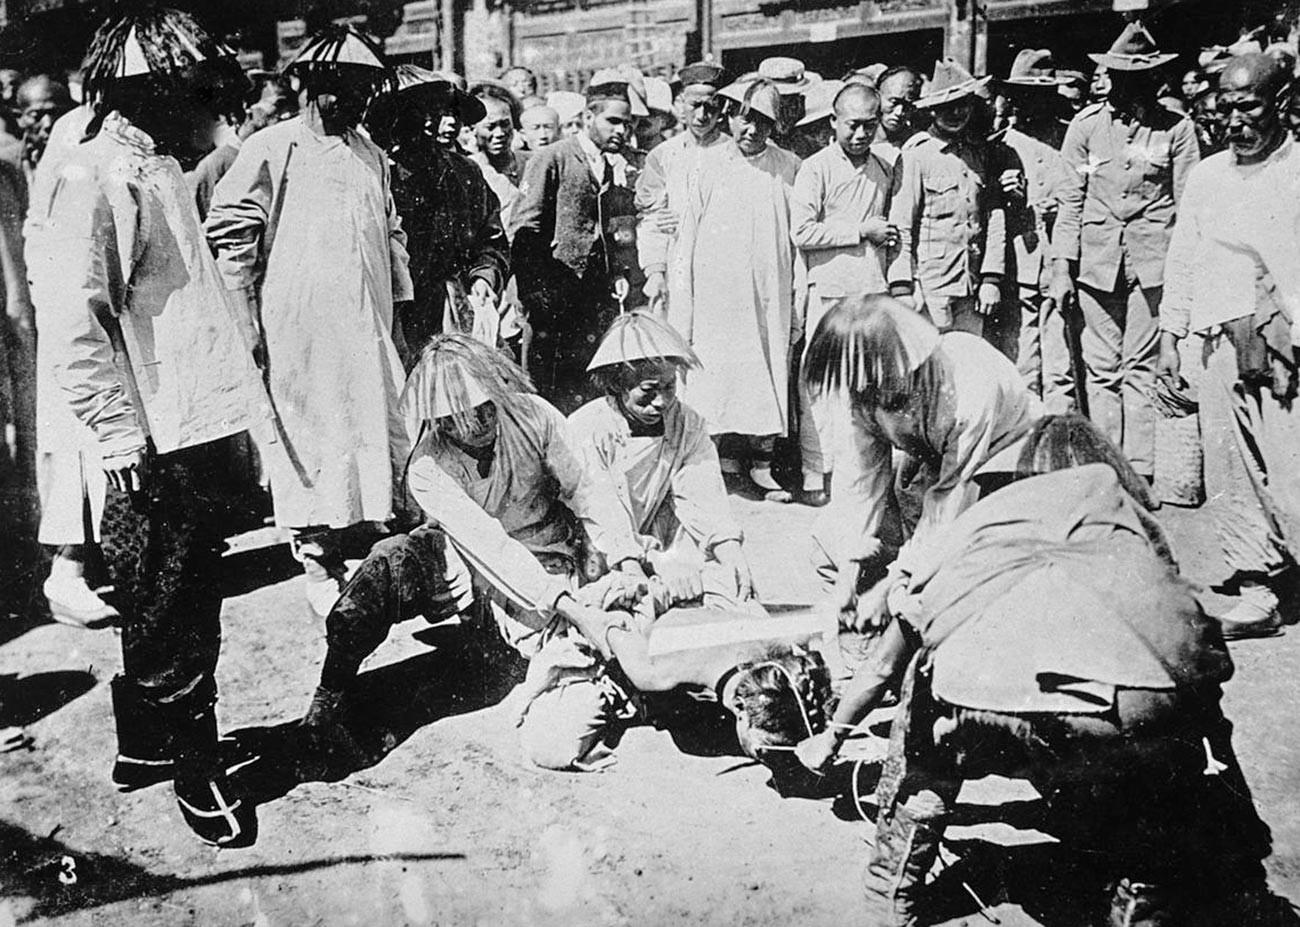 Un pugile decapitato davanti a una folla di cinesi